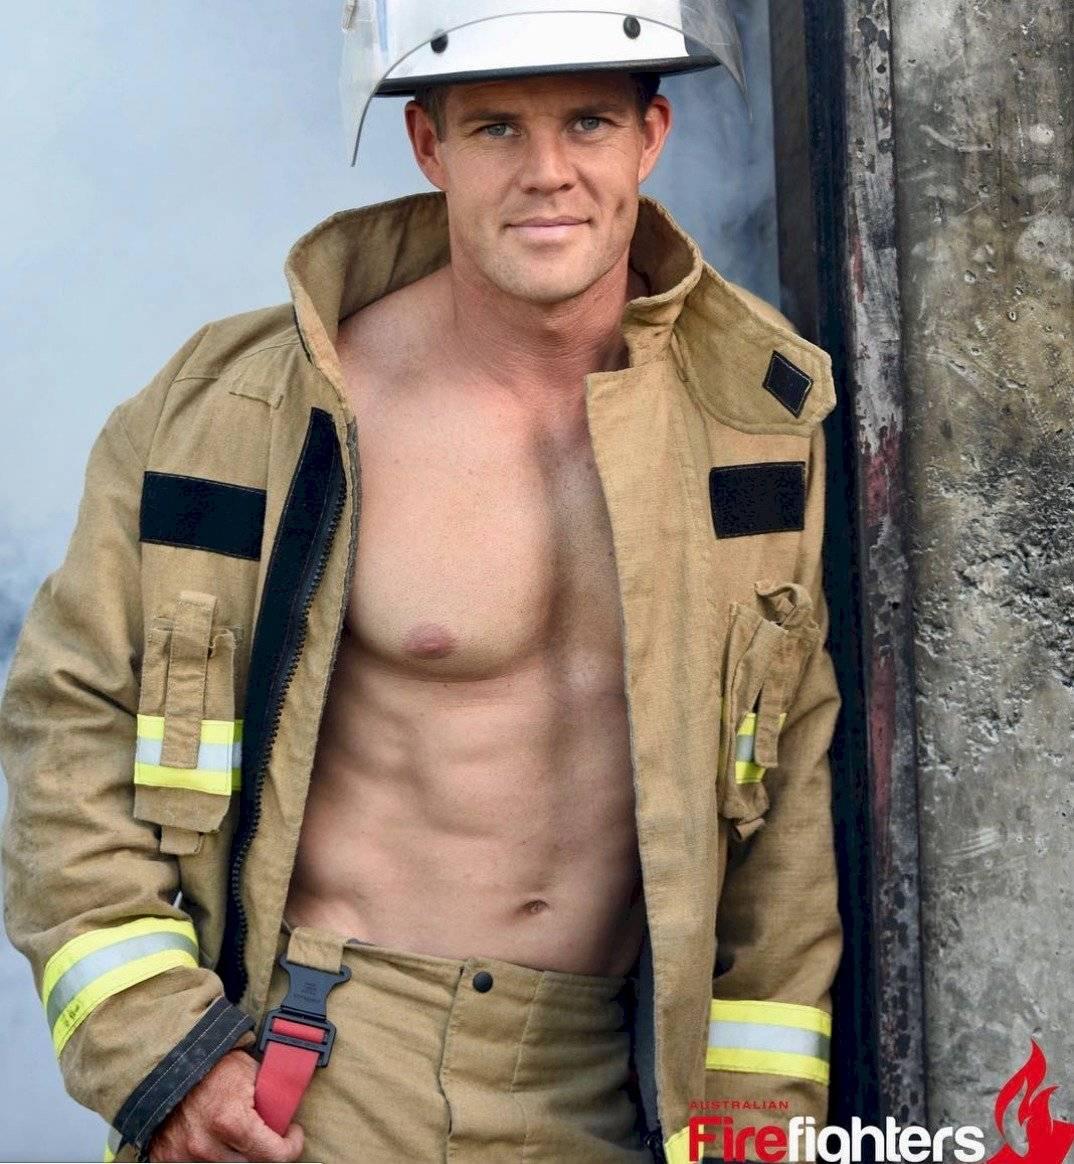 Instagram: @australianfirefighterscalendar